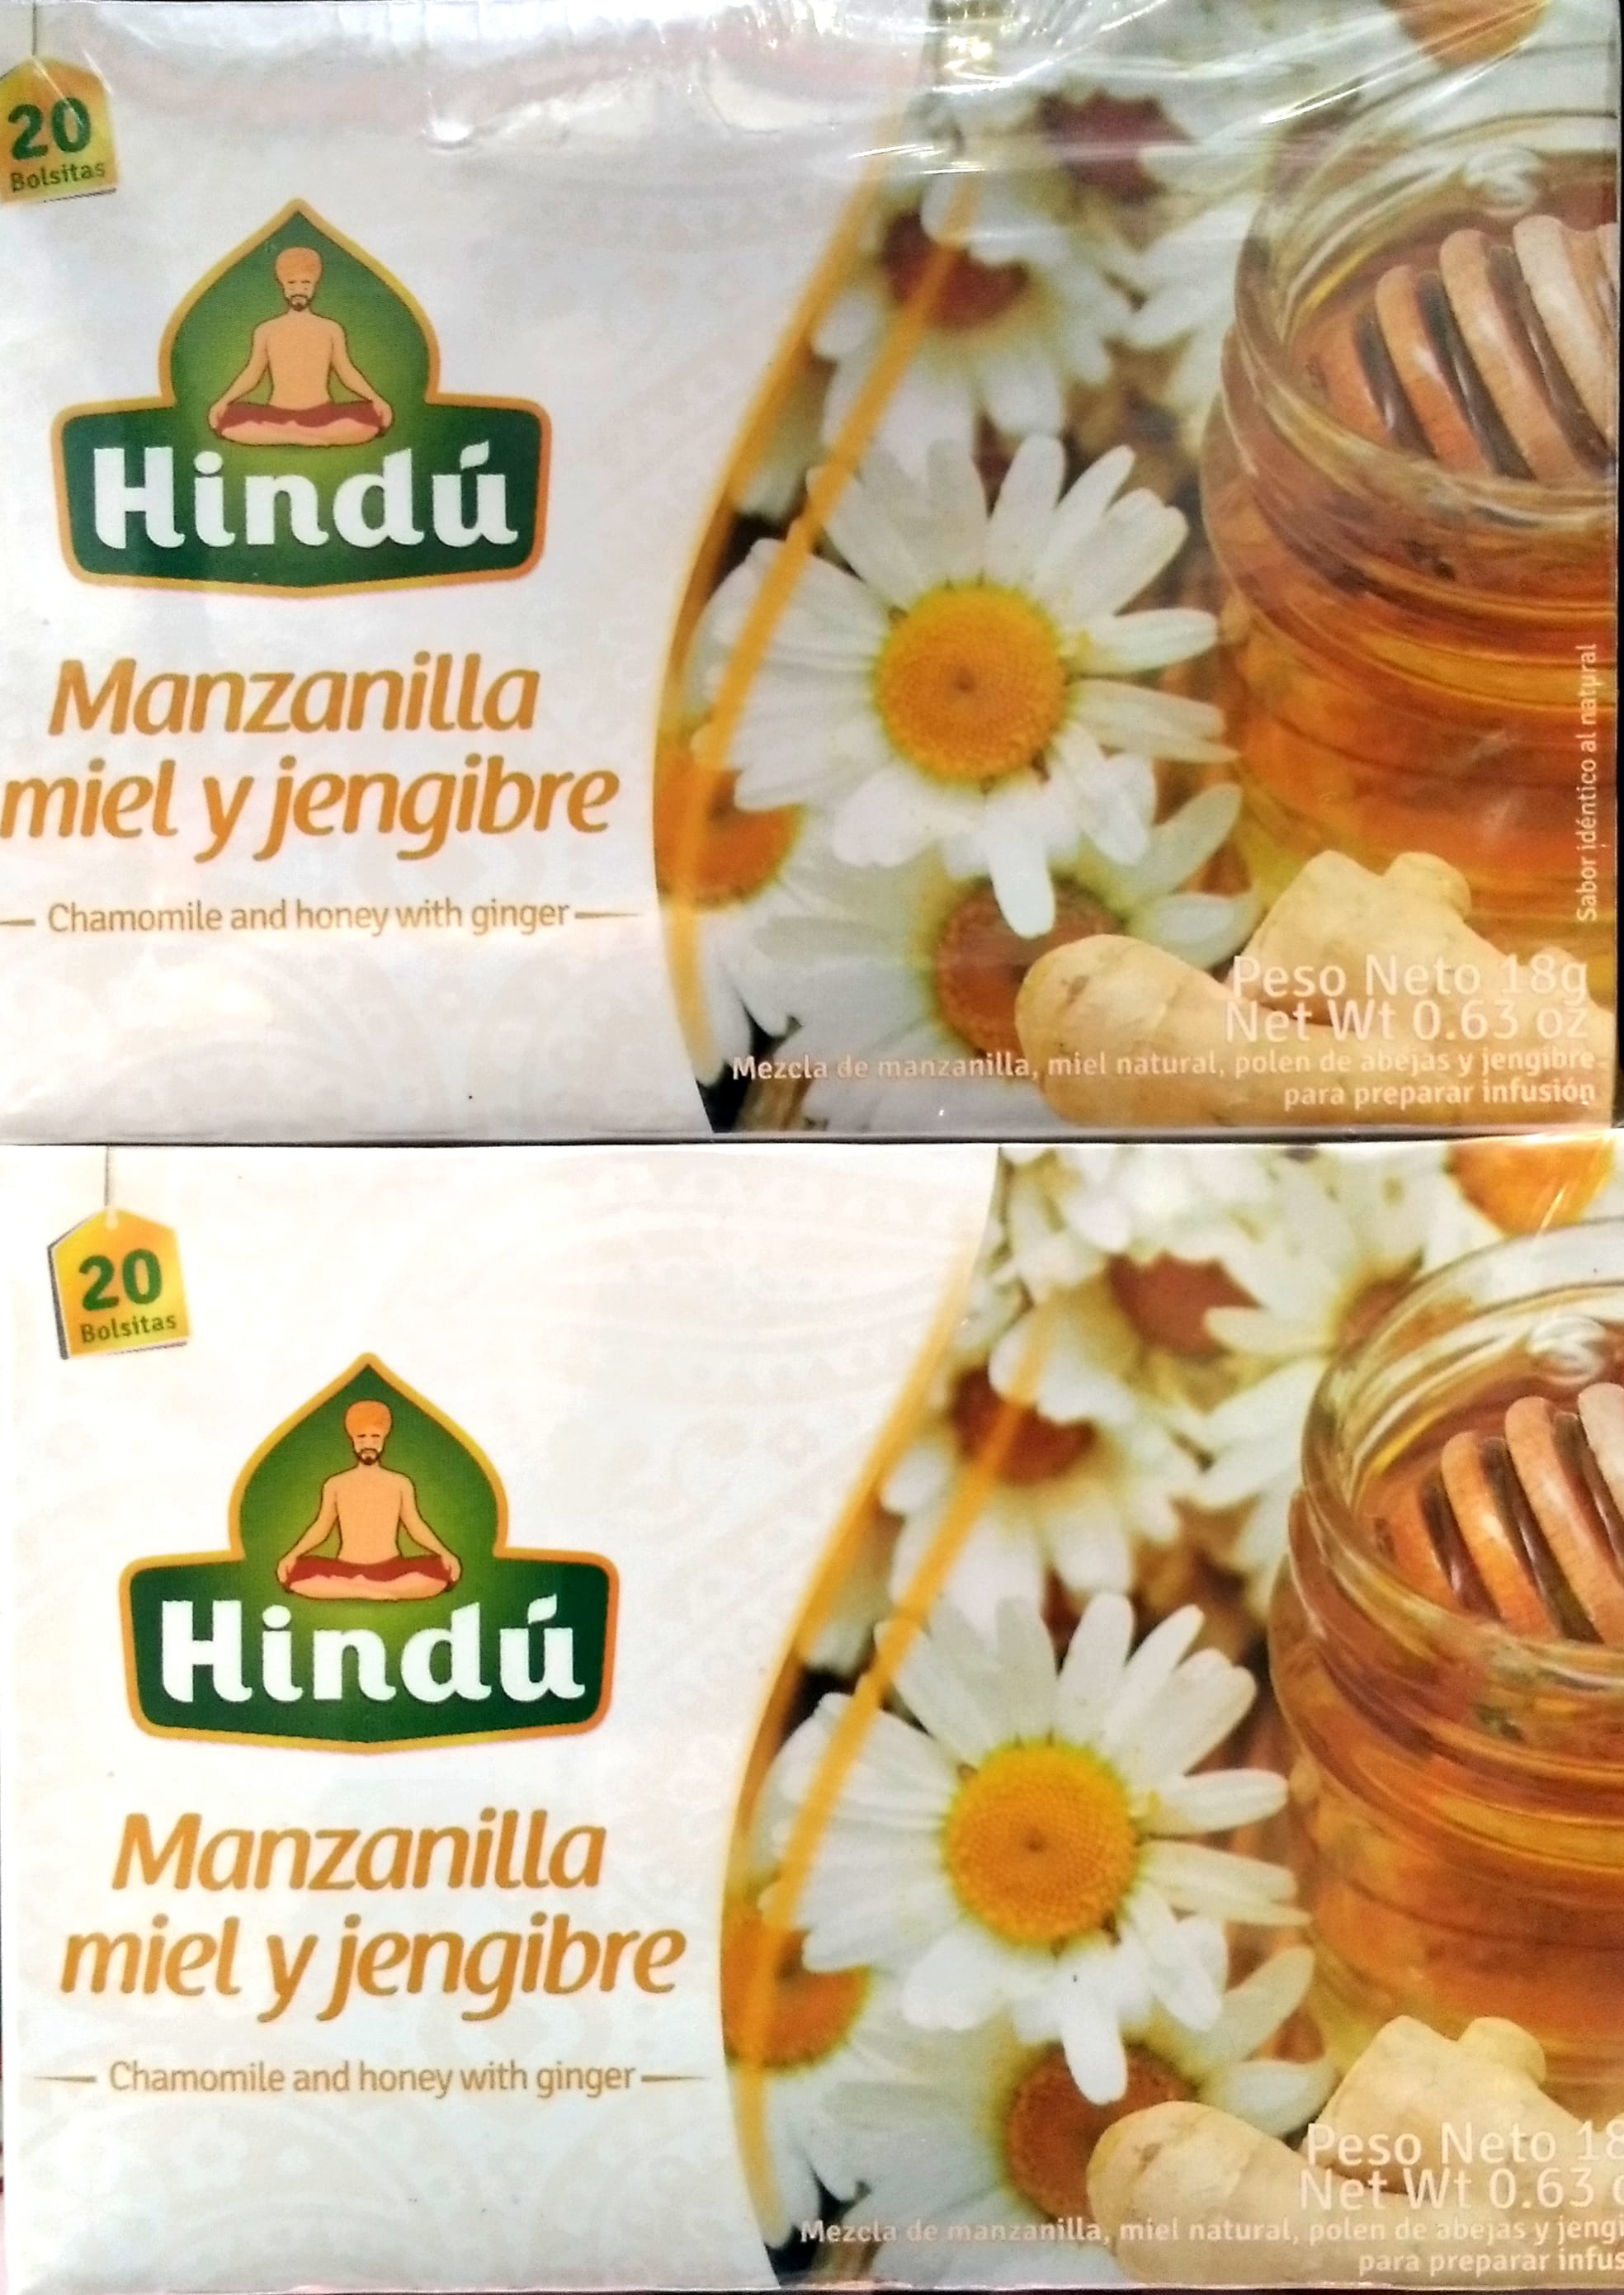 Infusion Hindu Manzanilla Miel y Jengibre 20u x2 36g